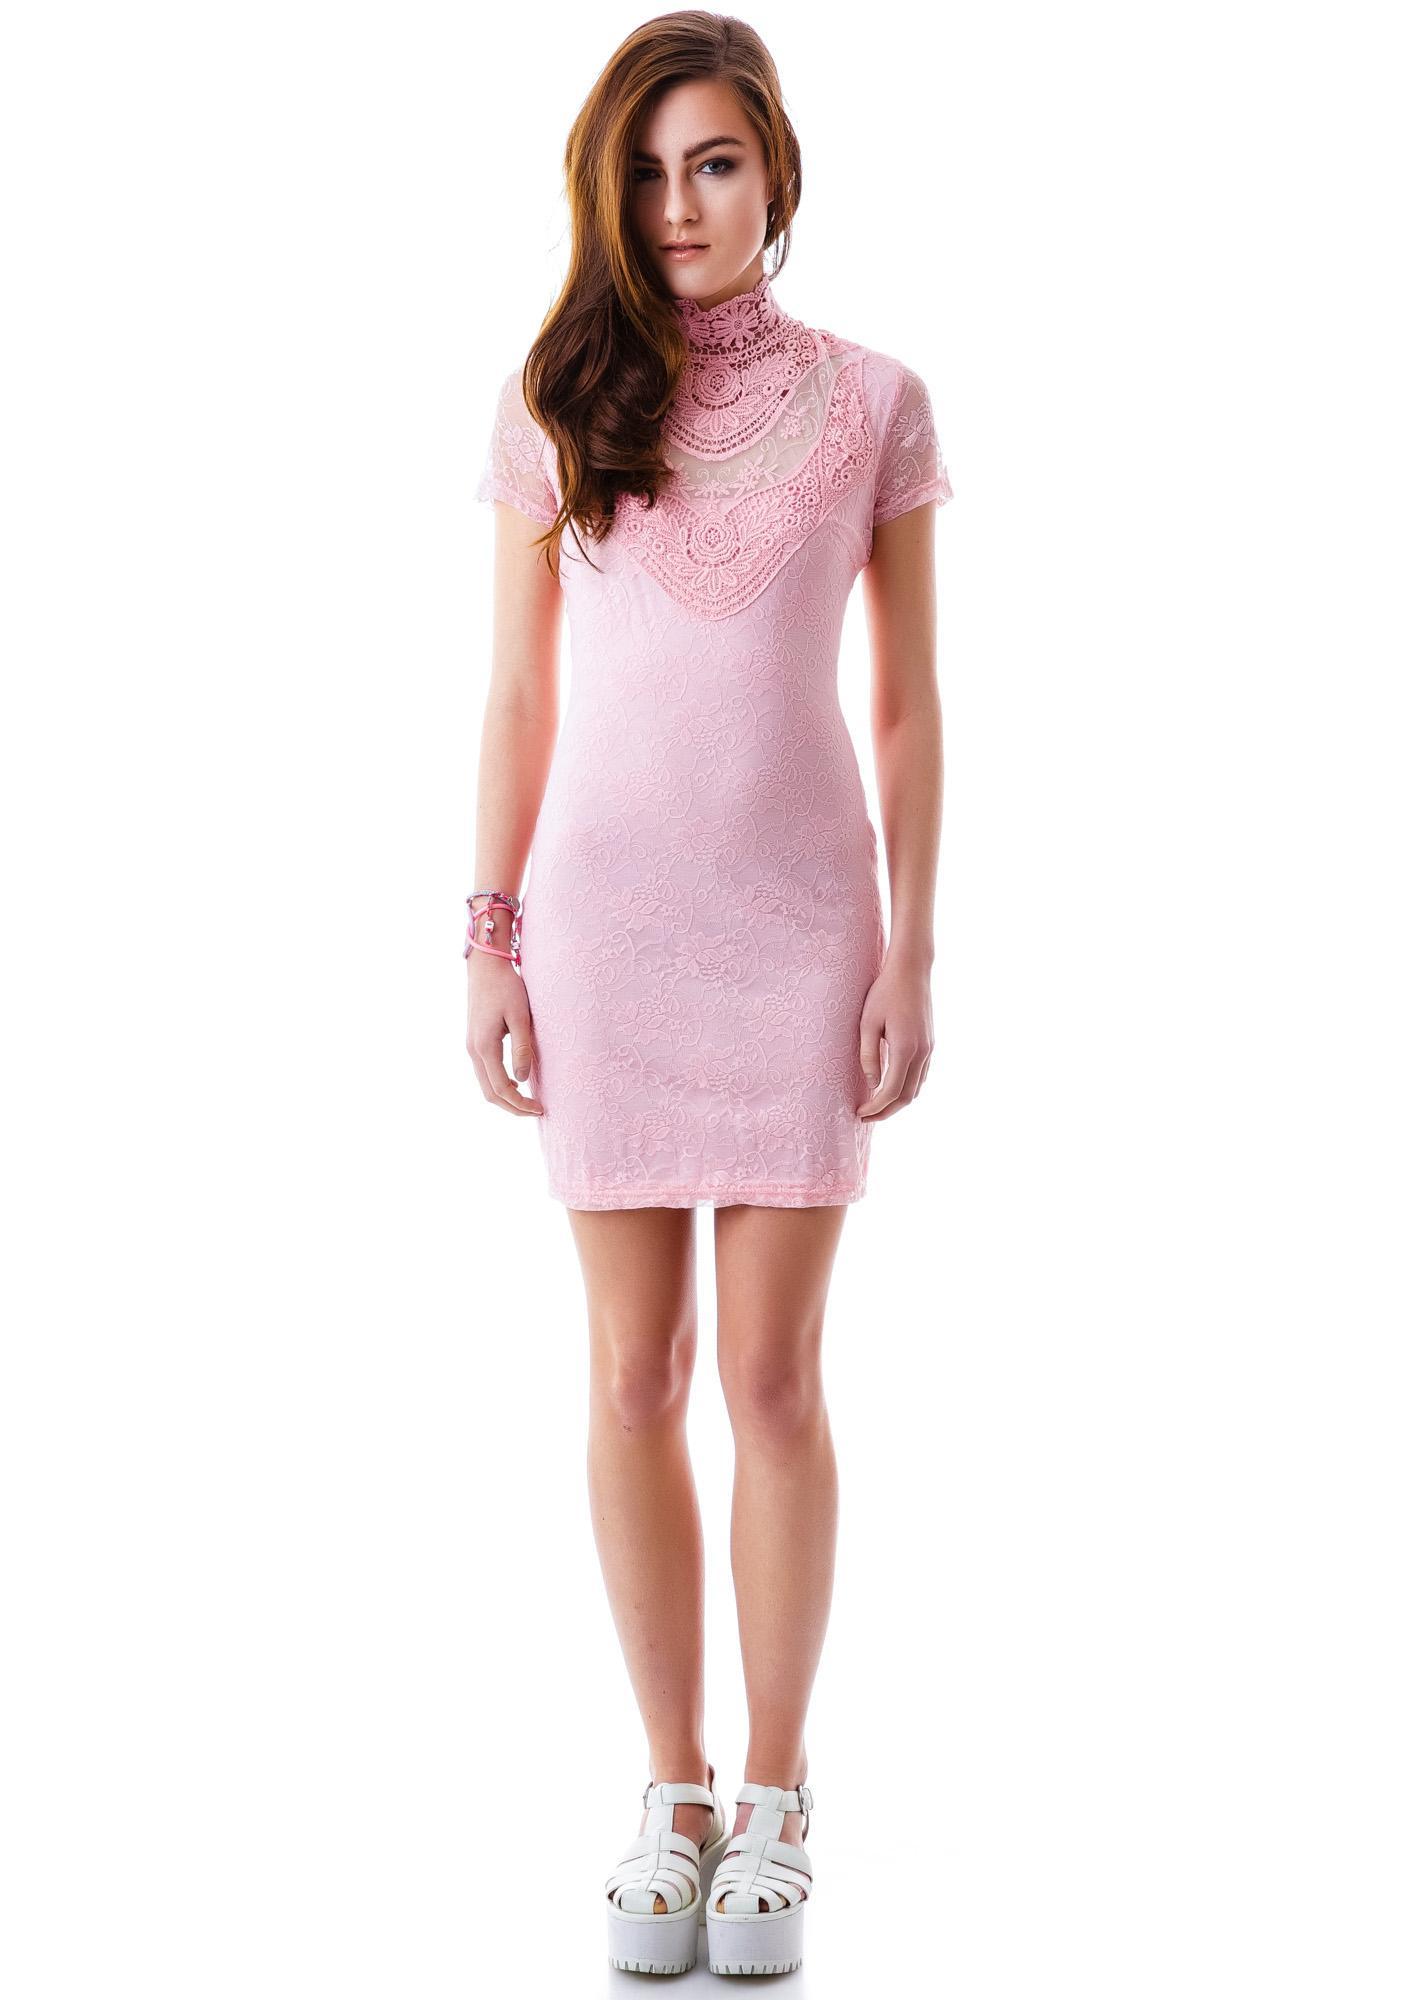 Pretty in Peony Lace Dress